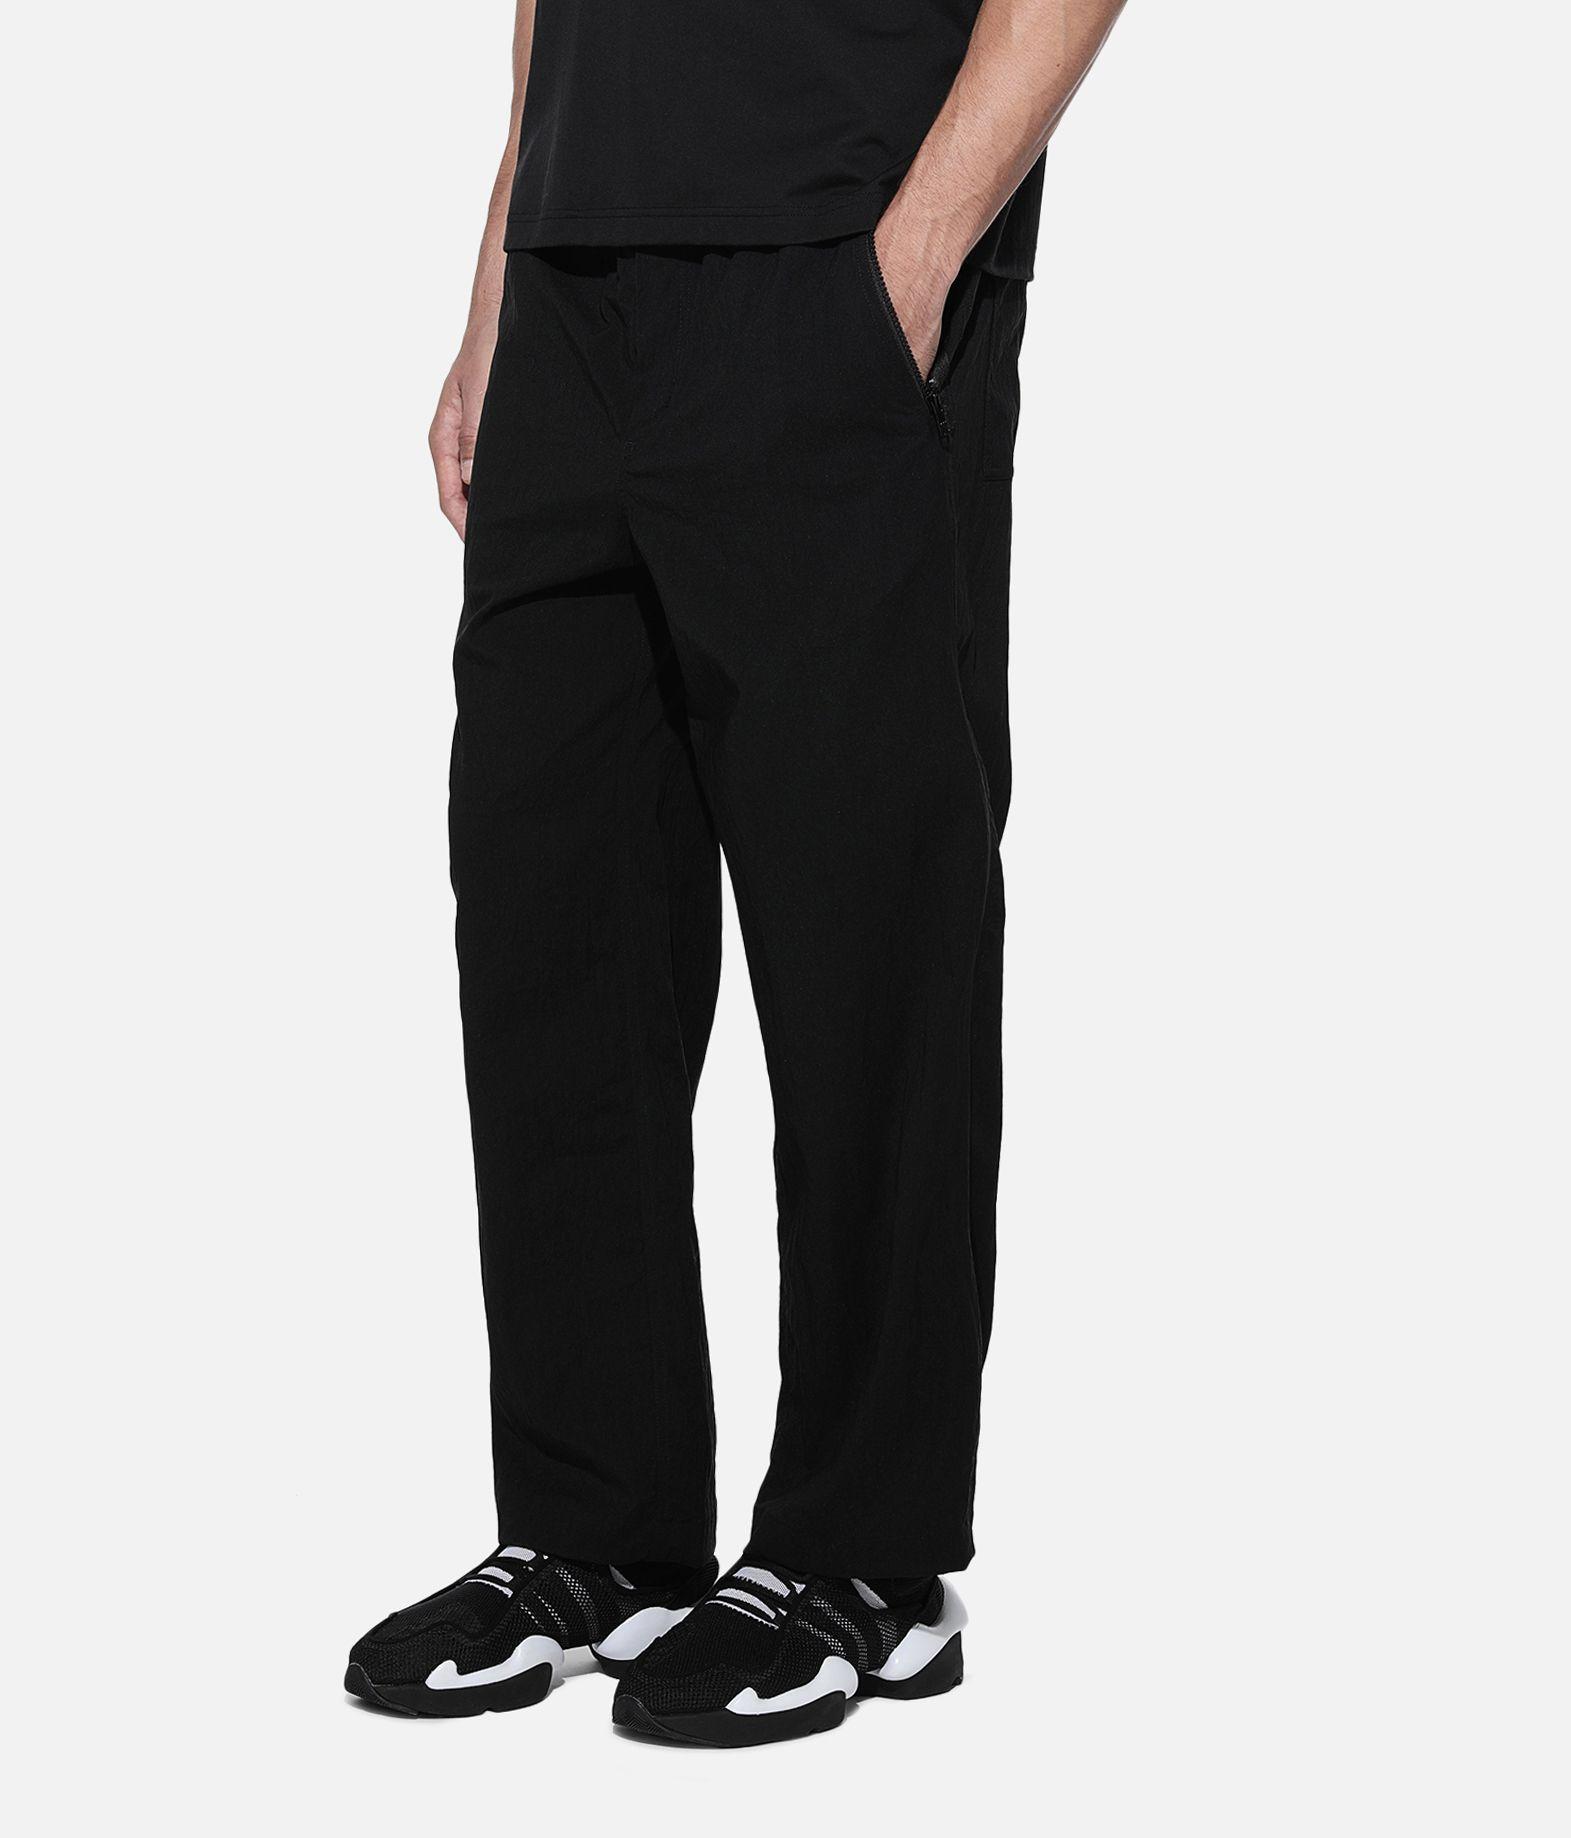 Y-3 Y-3 Slim Twill Pants Casual pants Man e